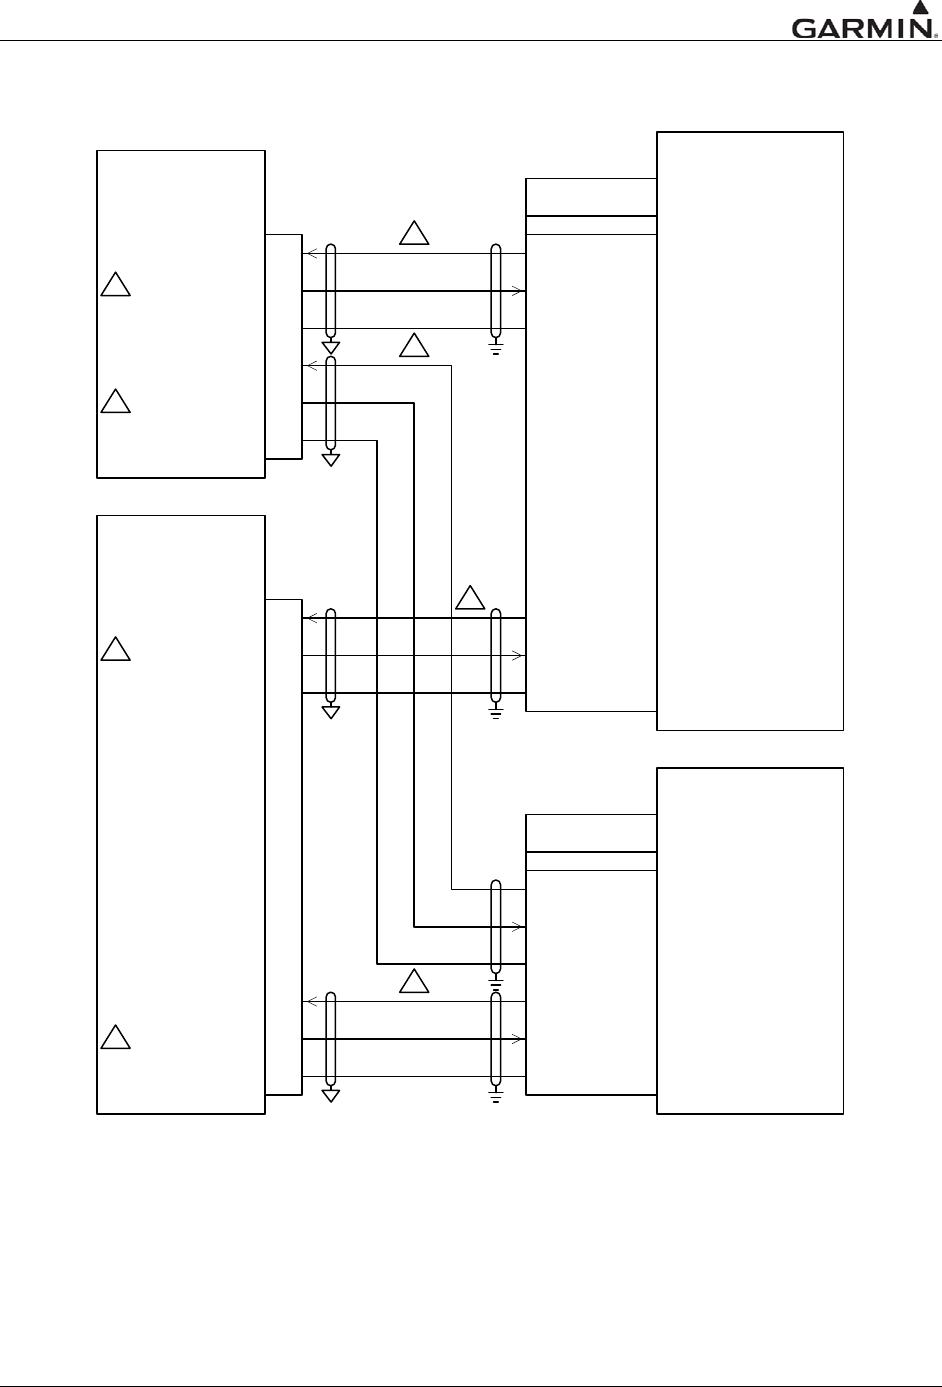 Handleiding Garmin Gtn 650 Pagina 326 Van 412 English 232 Wiring Diagram 190 01007 A3 6xx 7xx Aml Stc Installation Manual